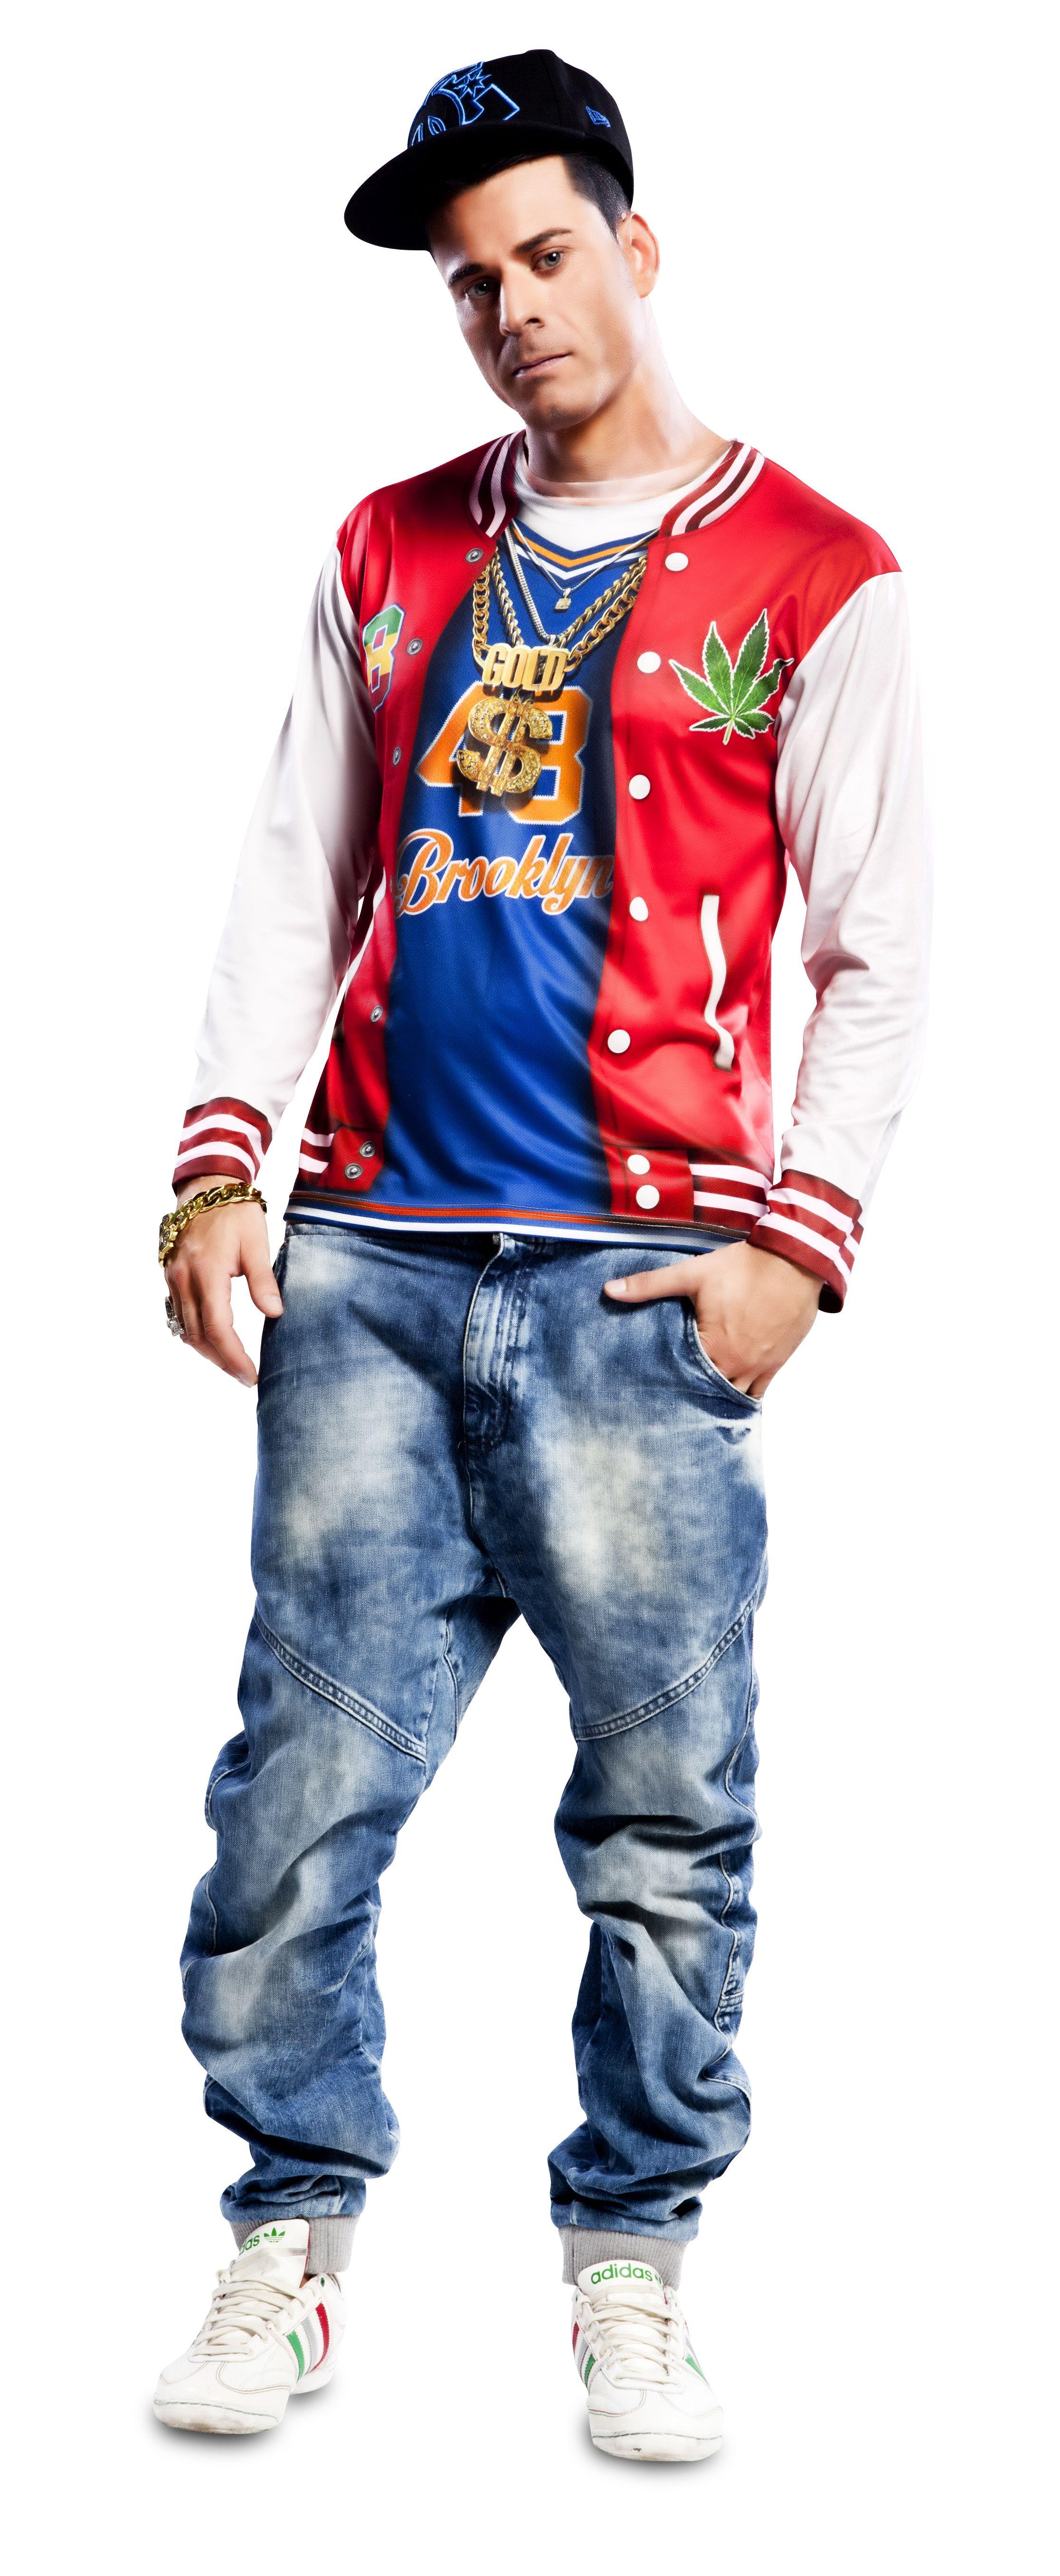 c16e115f1d7fd Disfraz Rapper.  Rapero  Music  Dollar  Original  Costume  BeOther ...